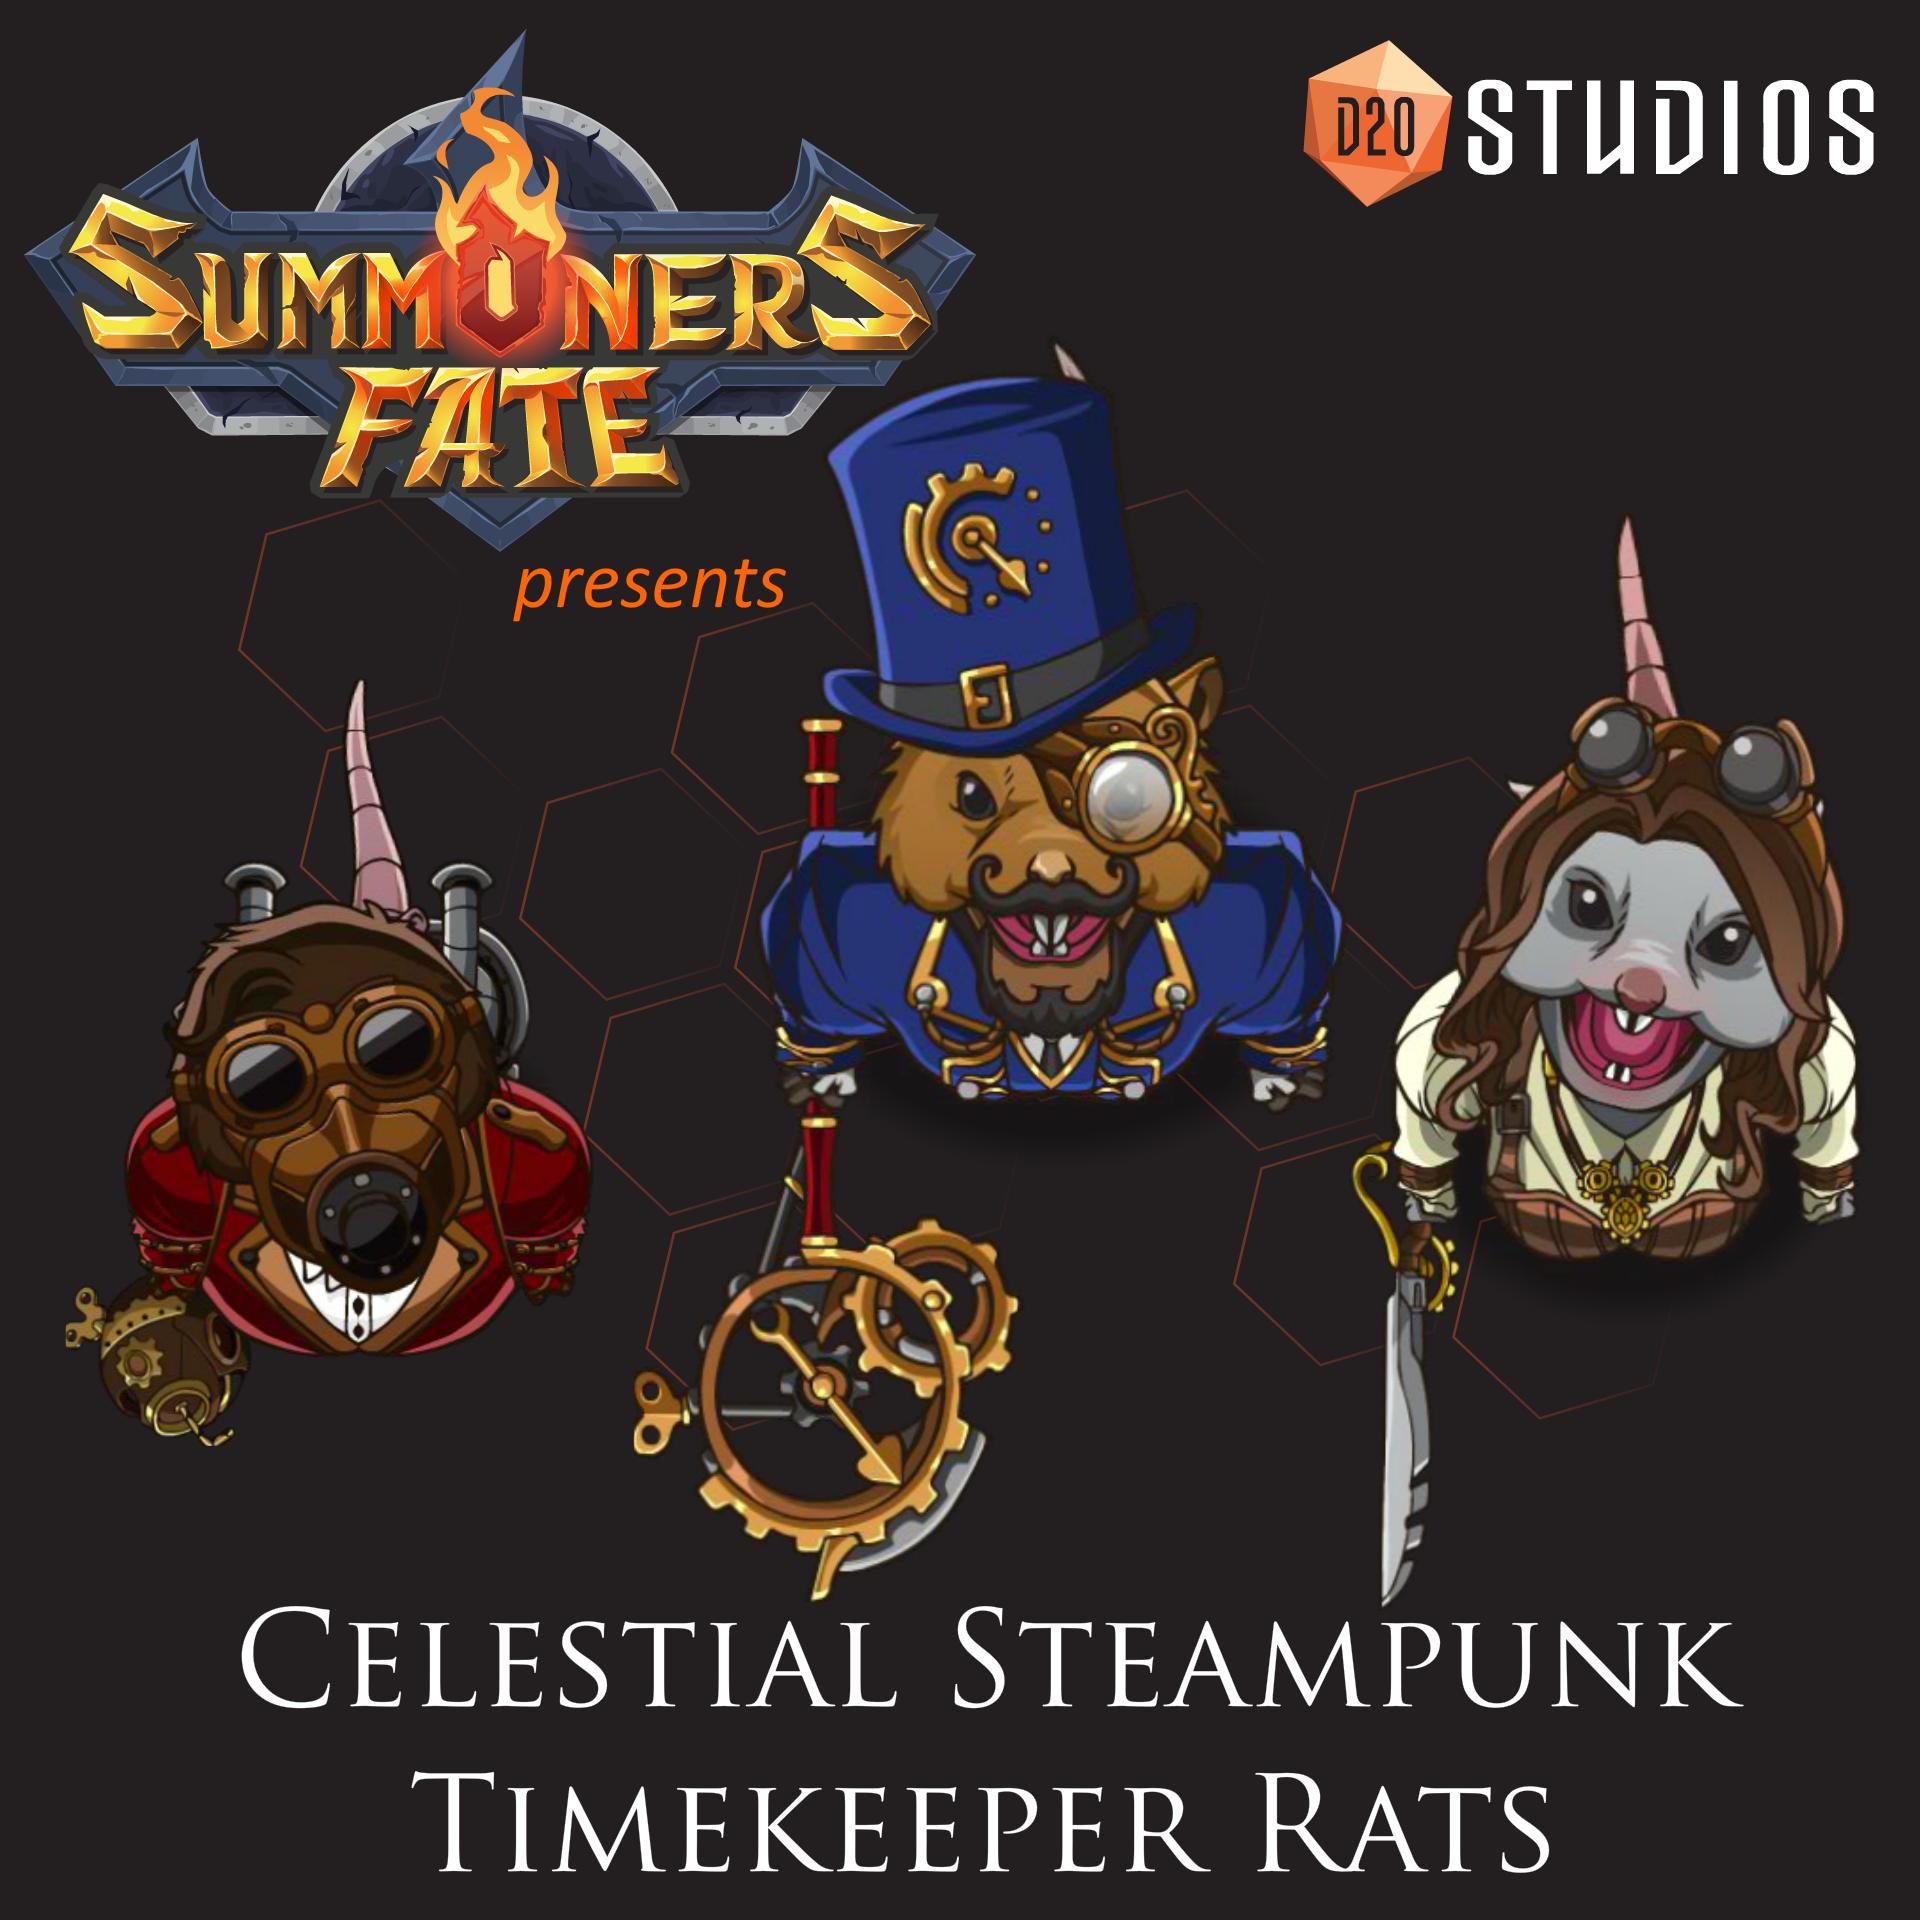 celestialSteampunkTimekeeperRats